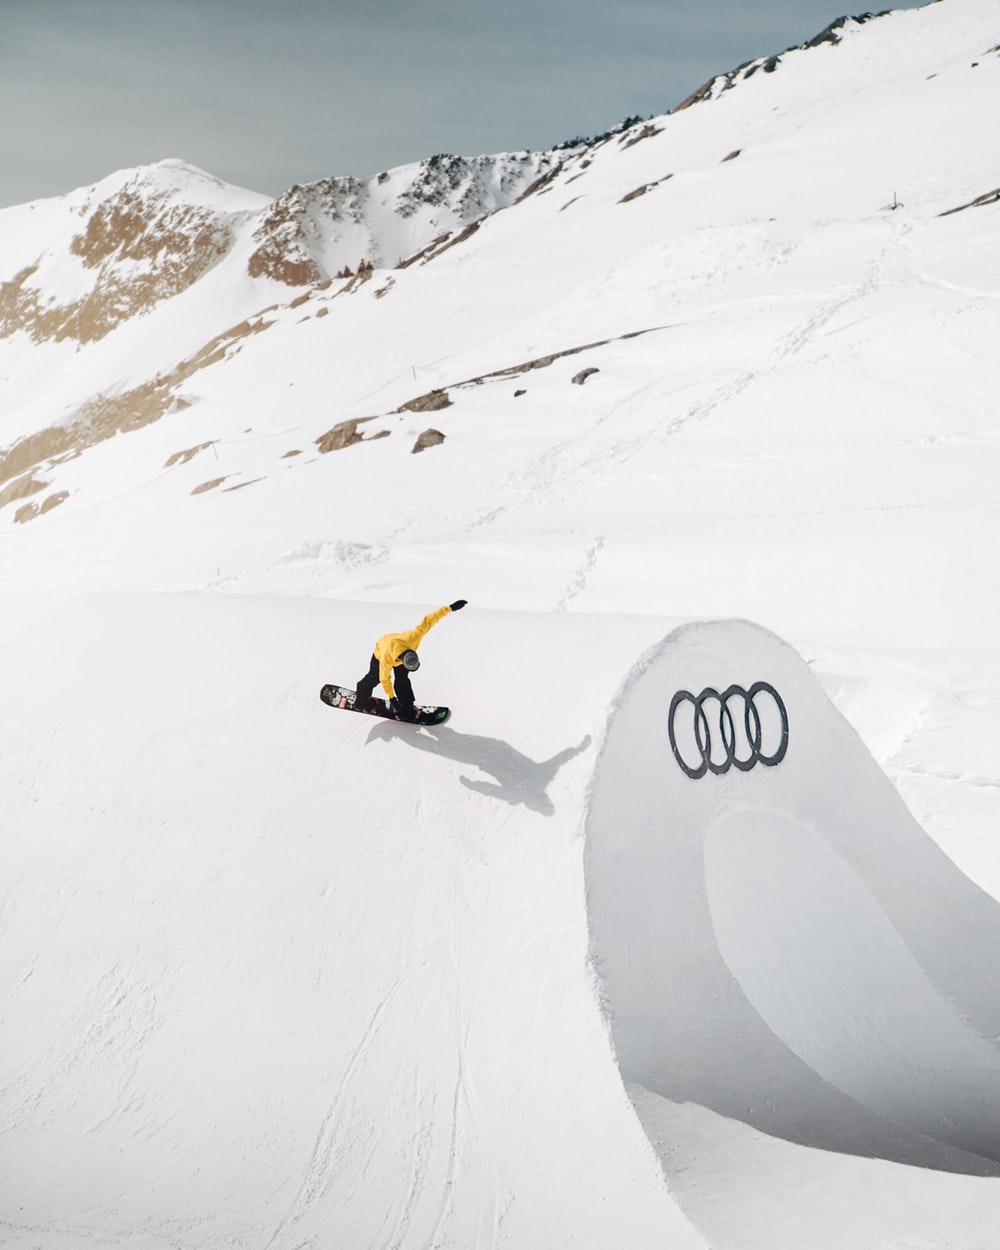 person snowboarding using black snowboard